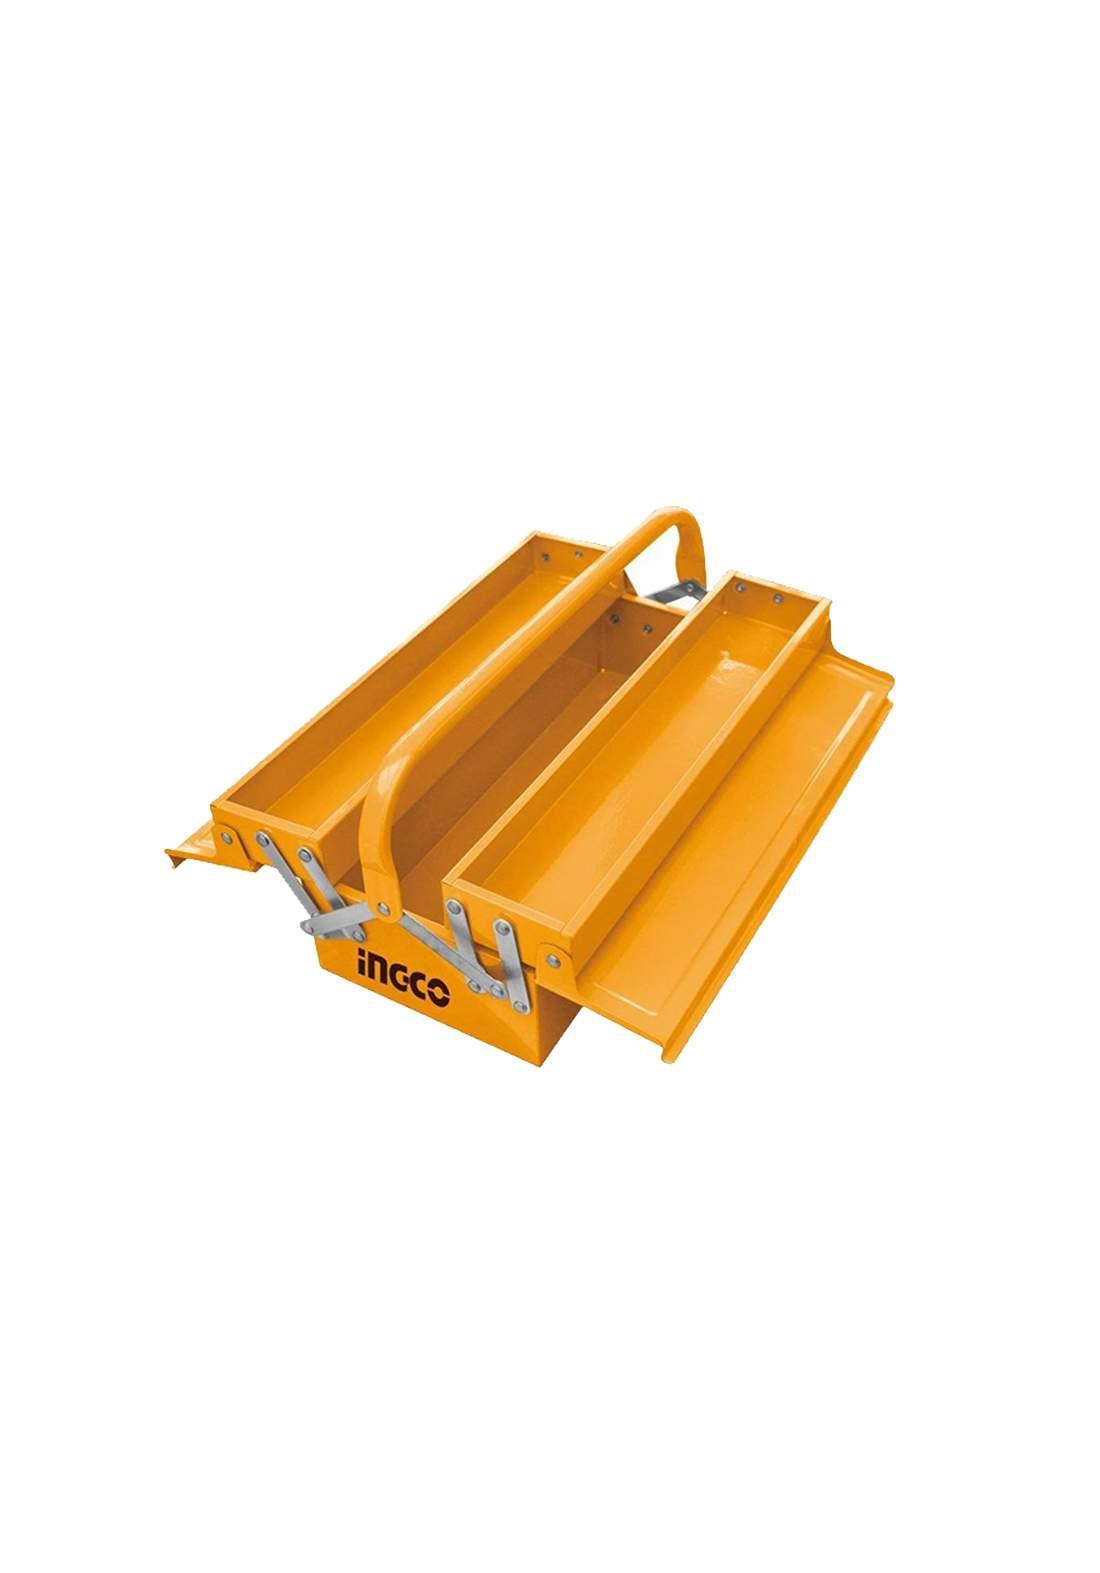 Ingco HTB04 Metal Tool Box Yallow  صندوق حفظ وتنظيم العُدد